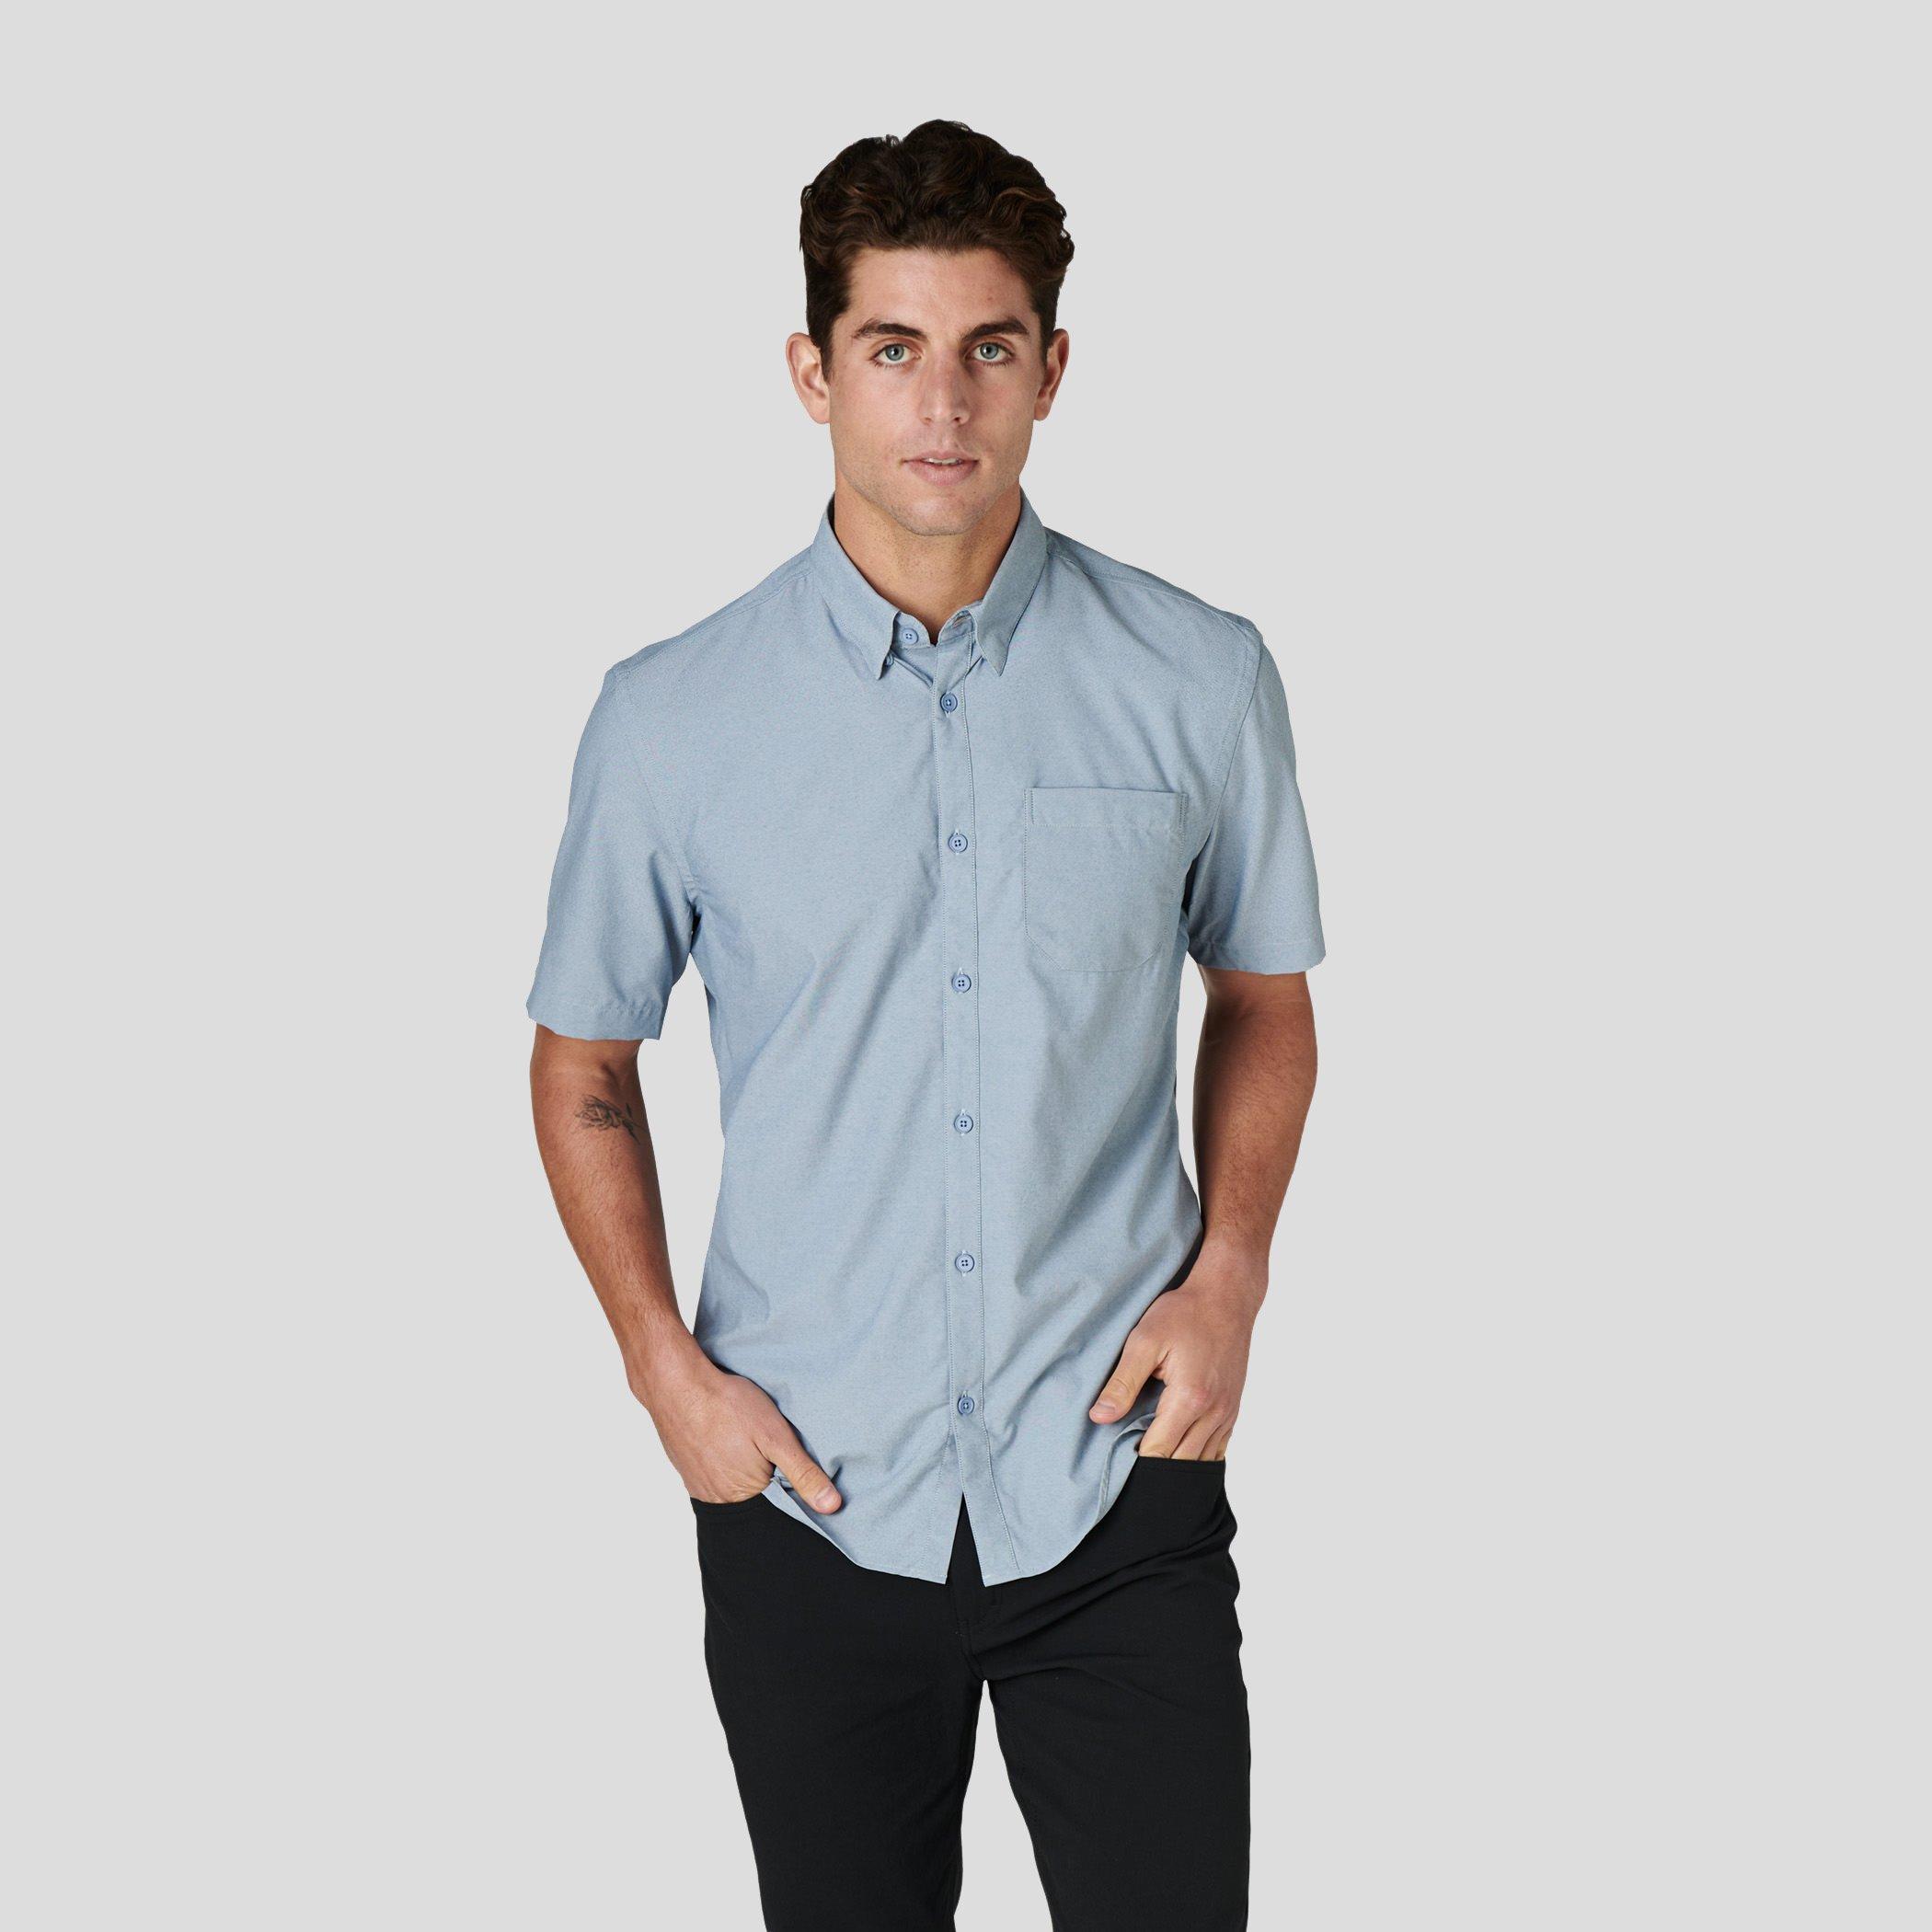 AirLight Short Sleeve Shirt